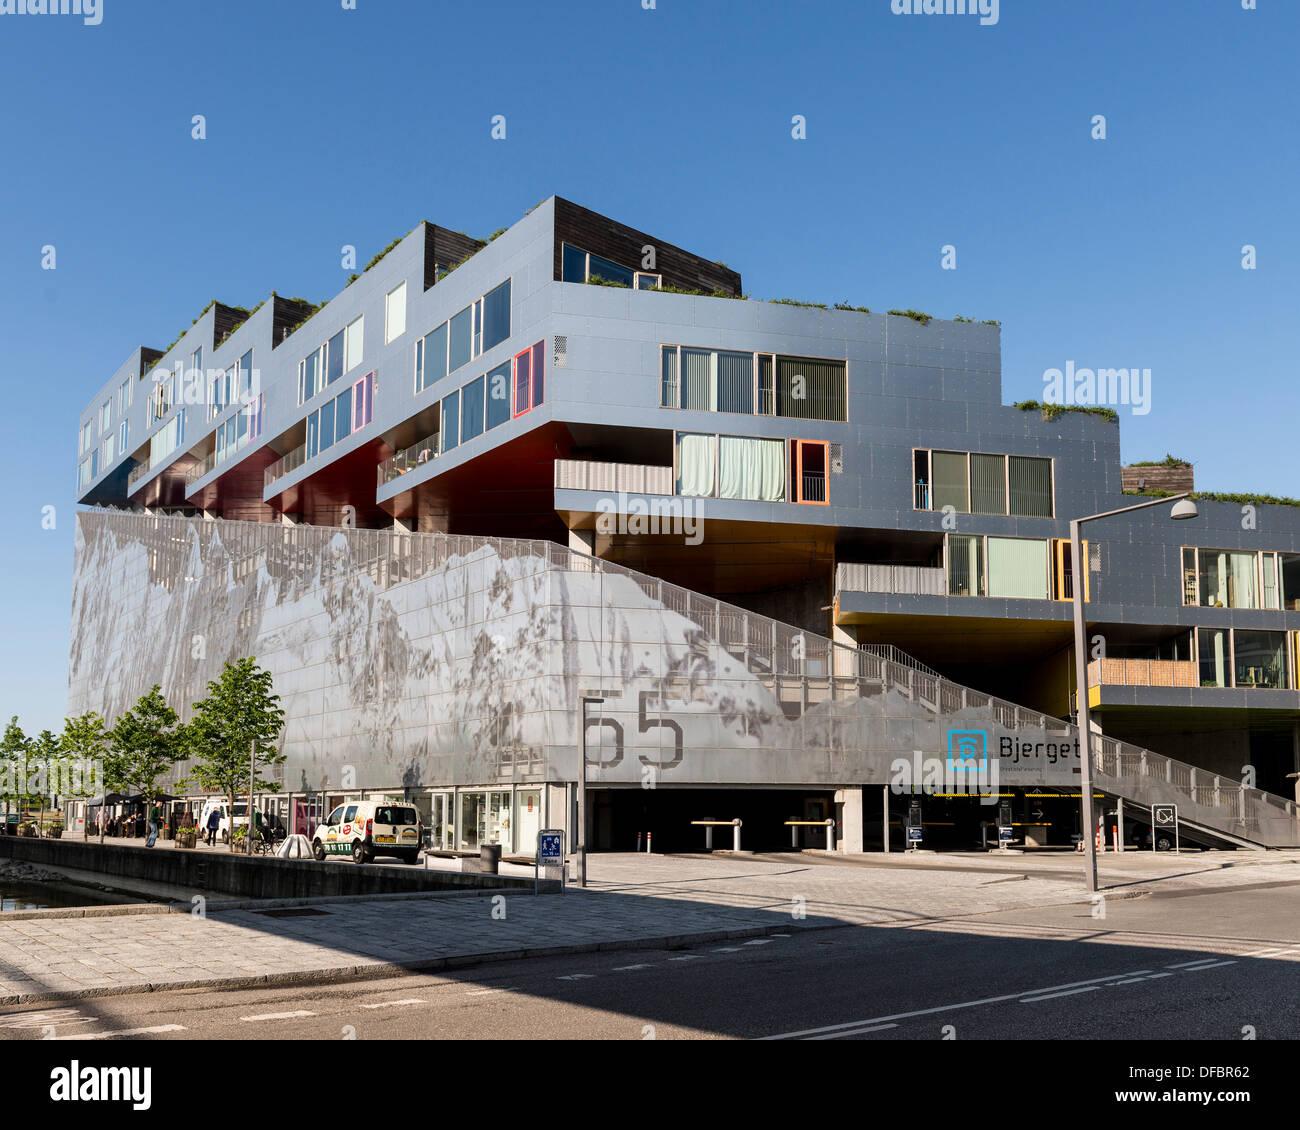 Mountain Dwelling (Bjerget), Copenhagen, Denmark. Architect: Bjarke Ingels Group (BIG), 2008. Stock Photo